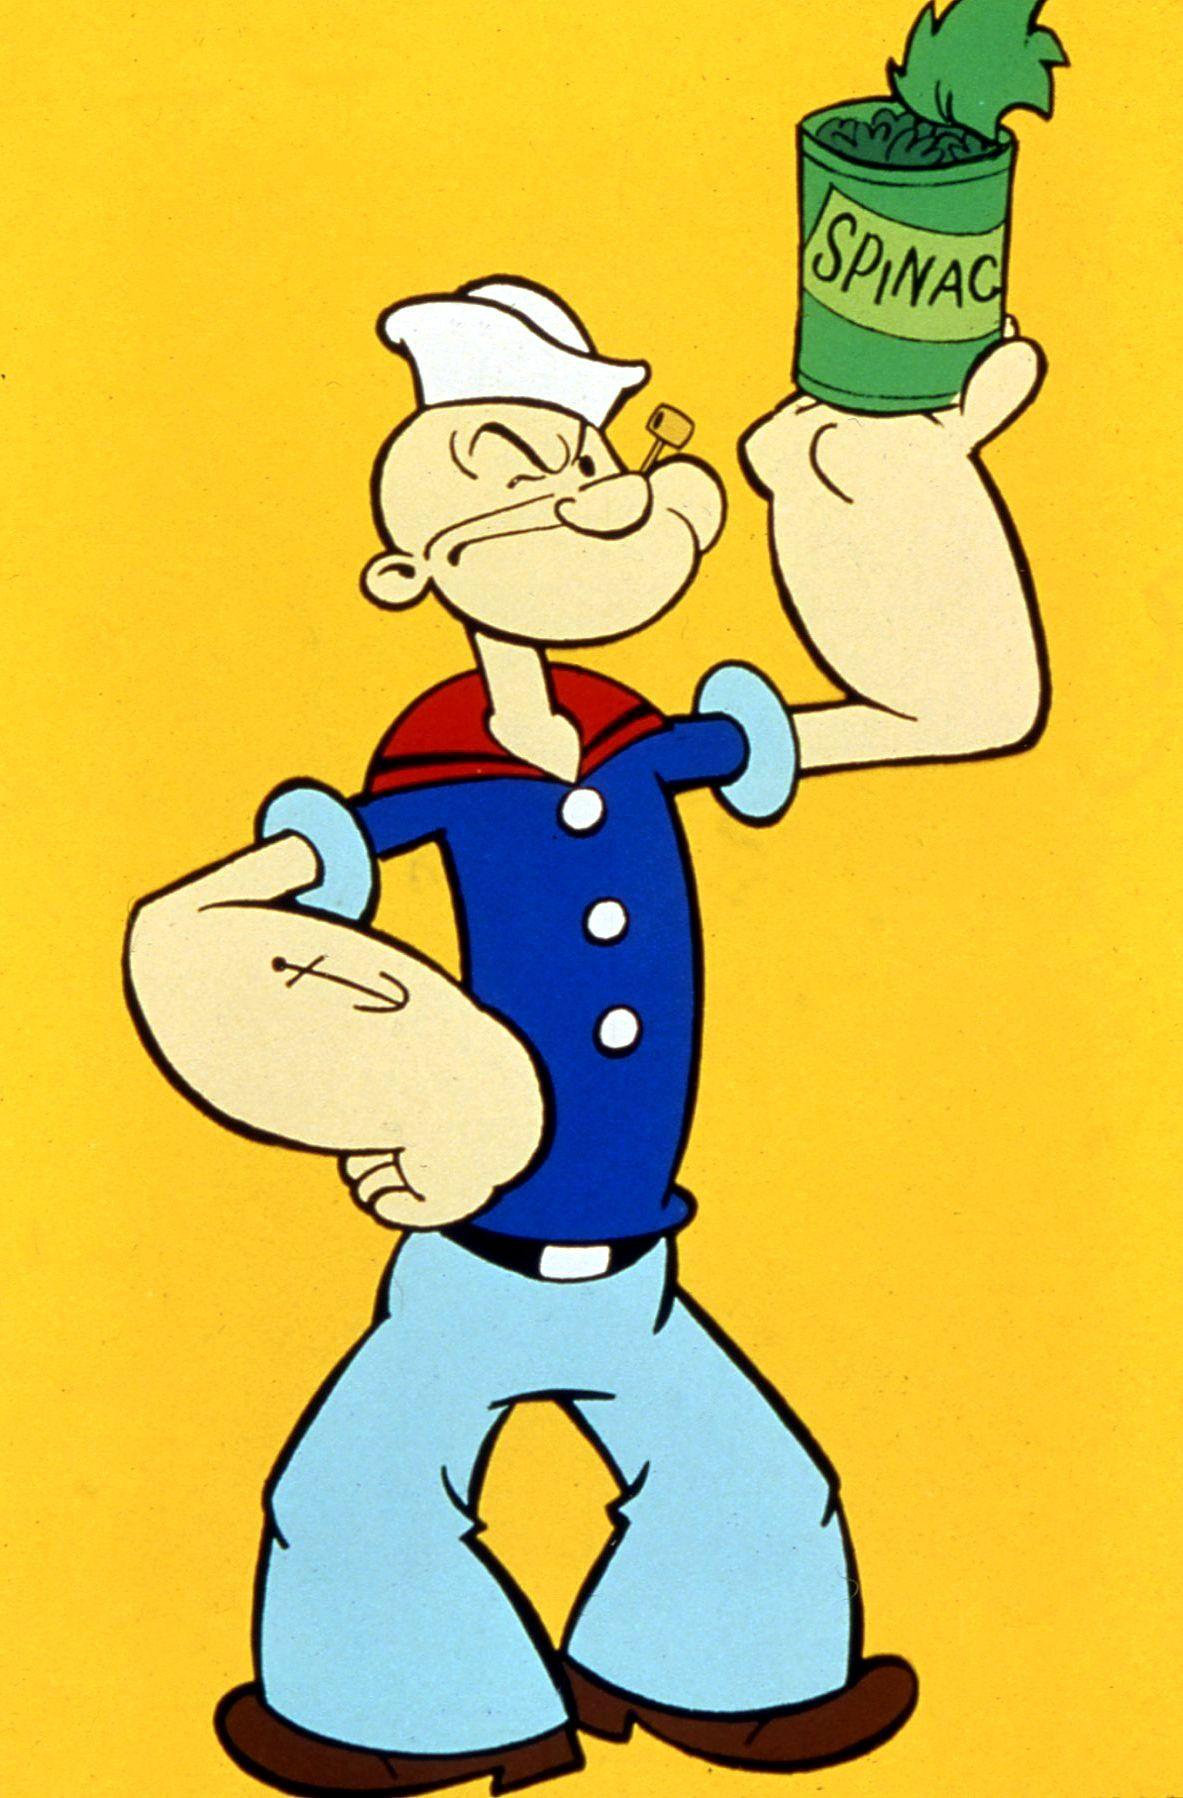 widescreen popeye sailor man cartoon with photos hd high quality of